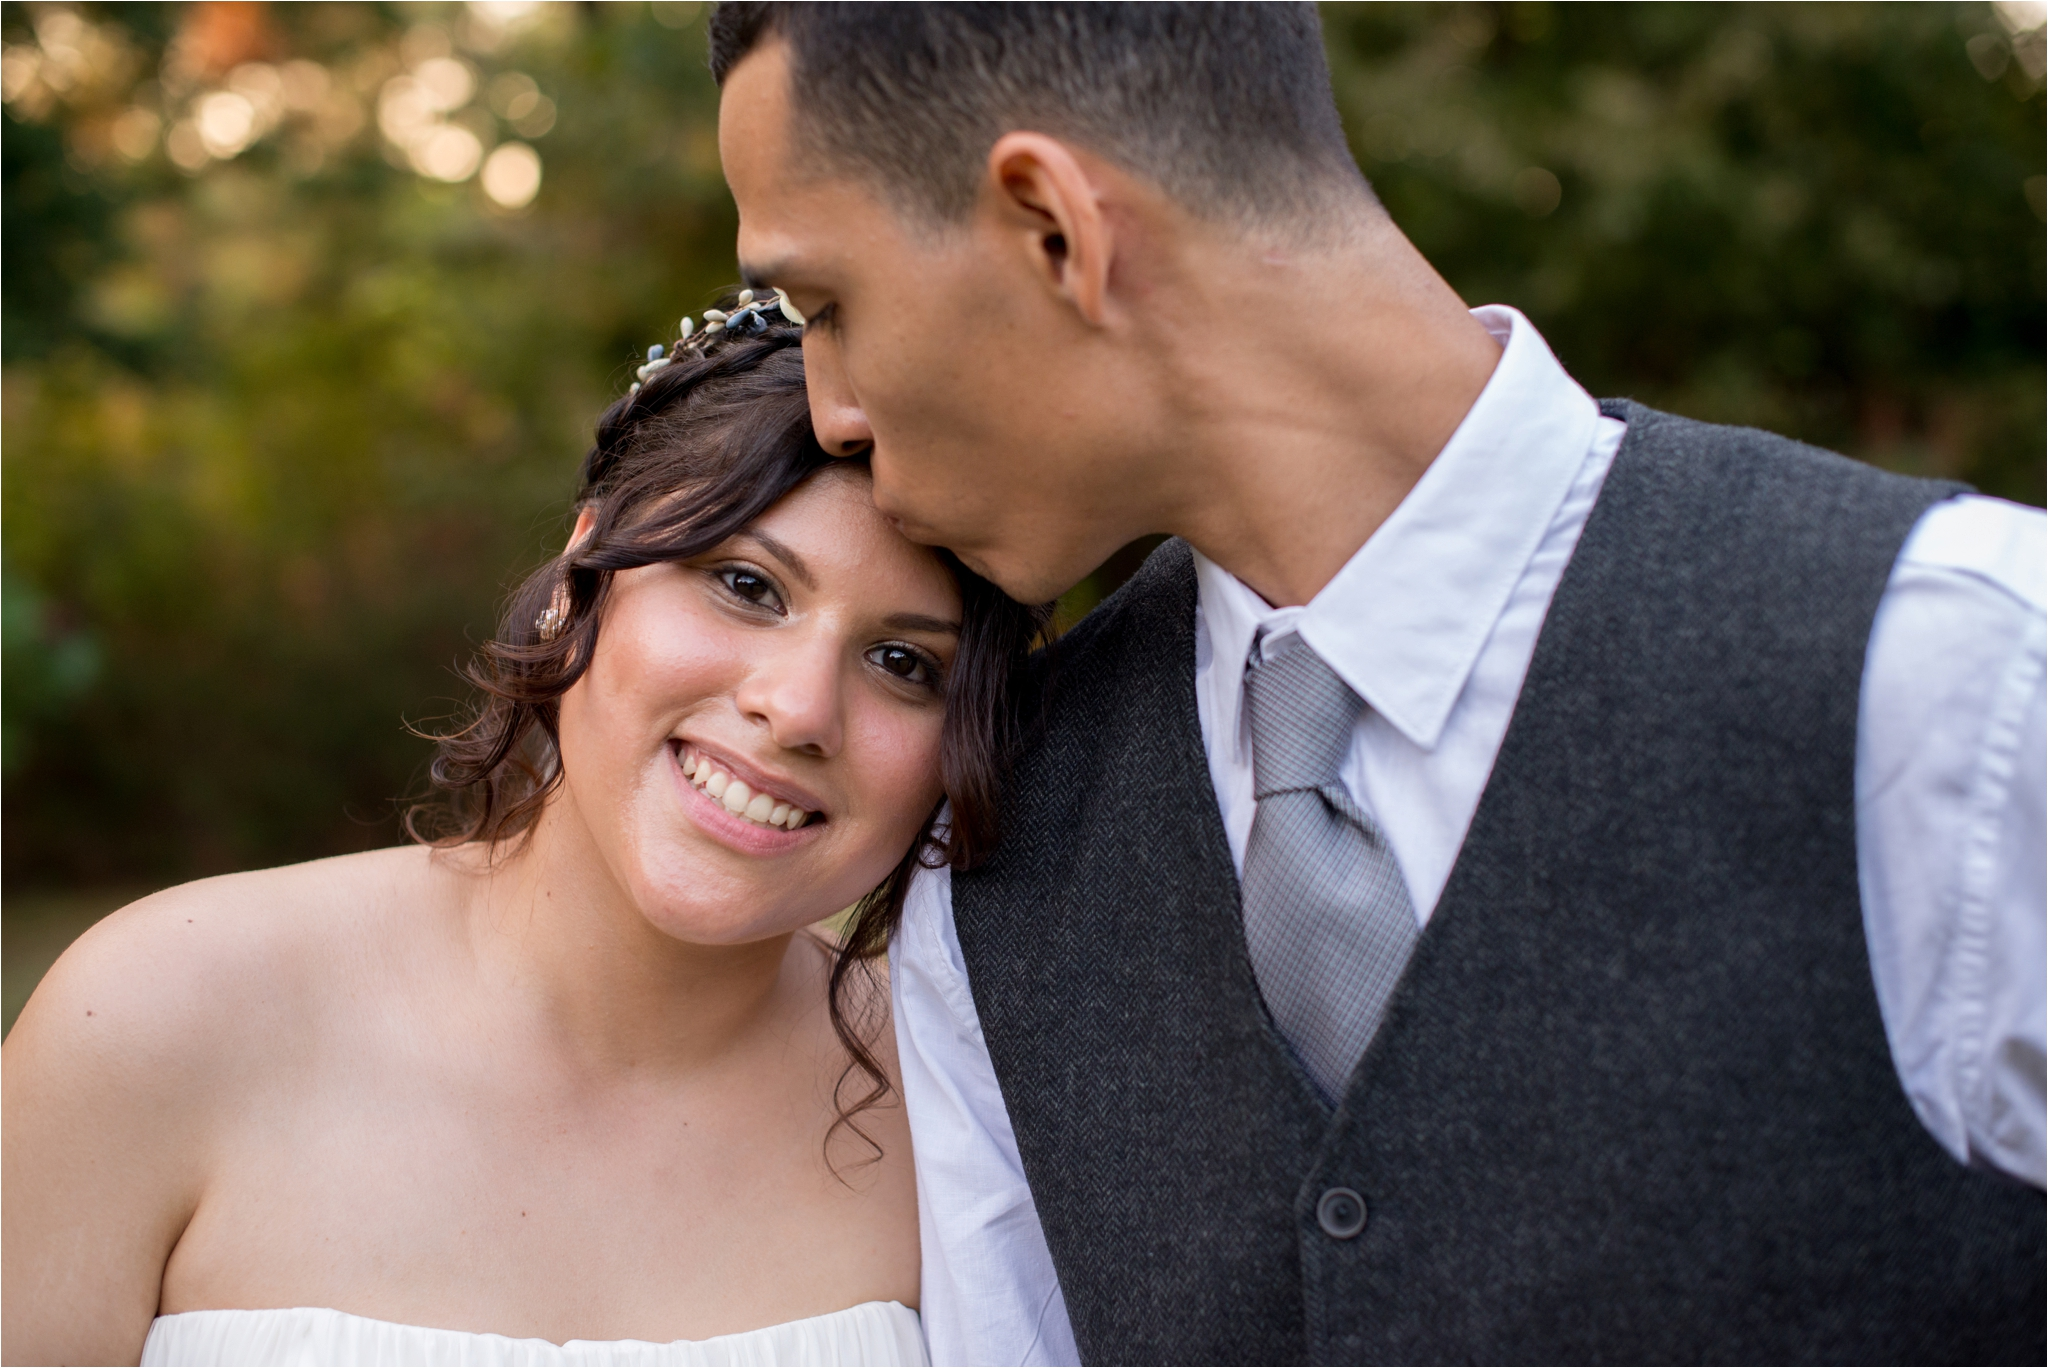 the-nifty-fifty-lens-jaclyn-auletta-photography-blog-north-carolina-wedding-photographer_0002.jpg